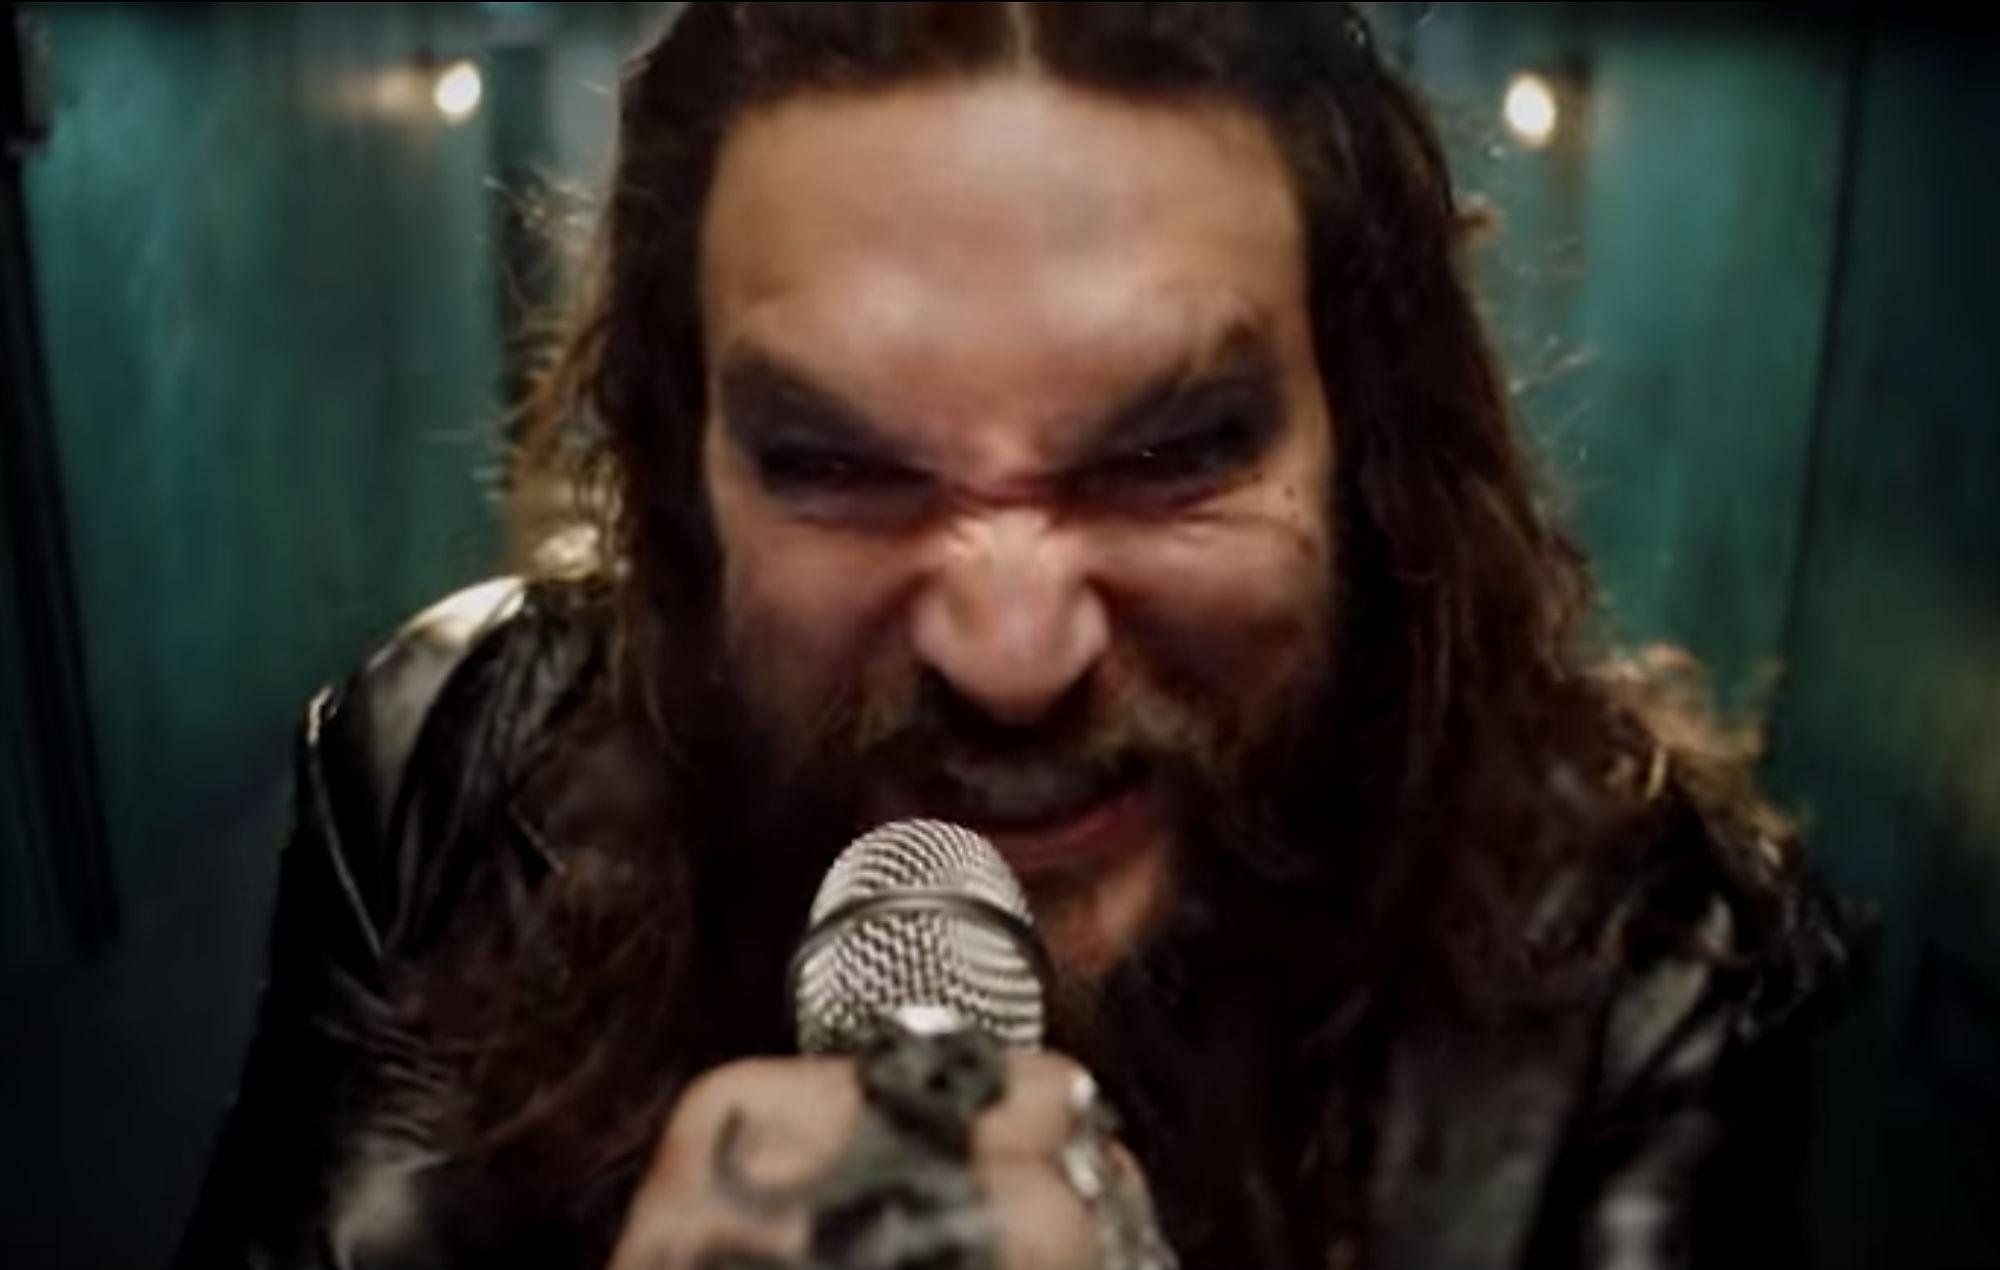 Jason Momoa stars as Ozzy Osbourne in 'Scary Little Green Men' teaser